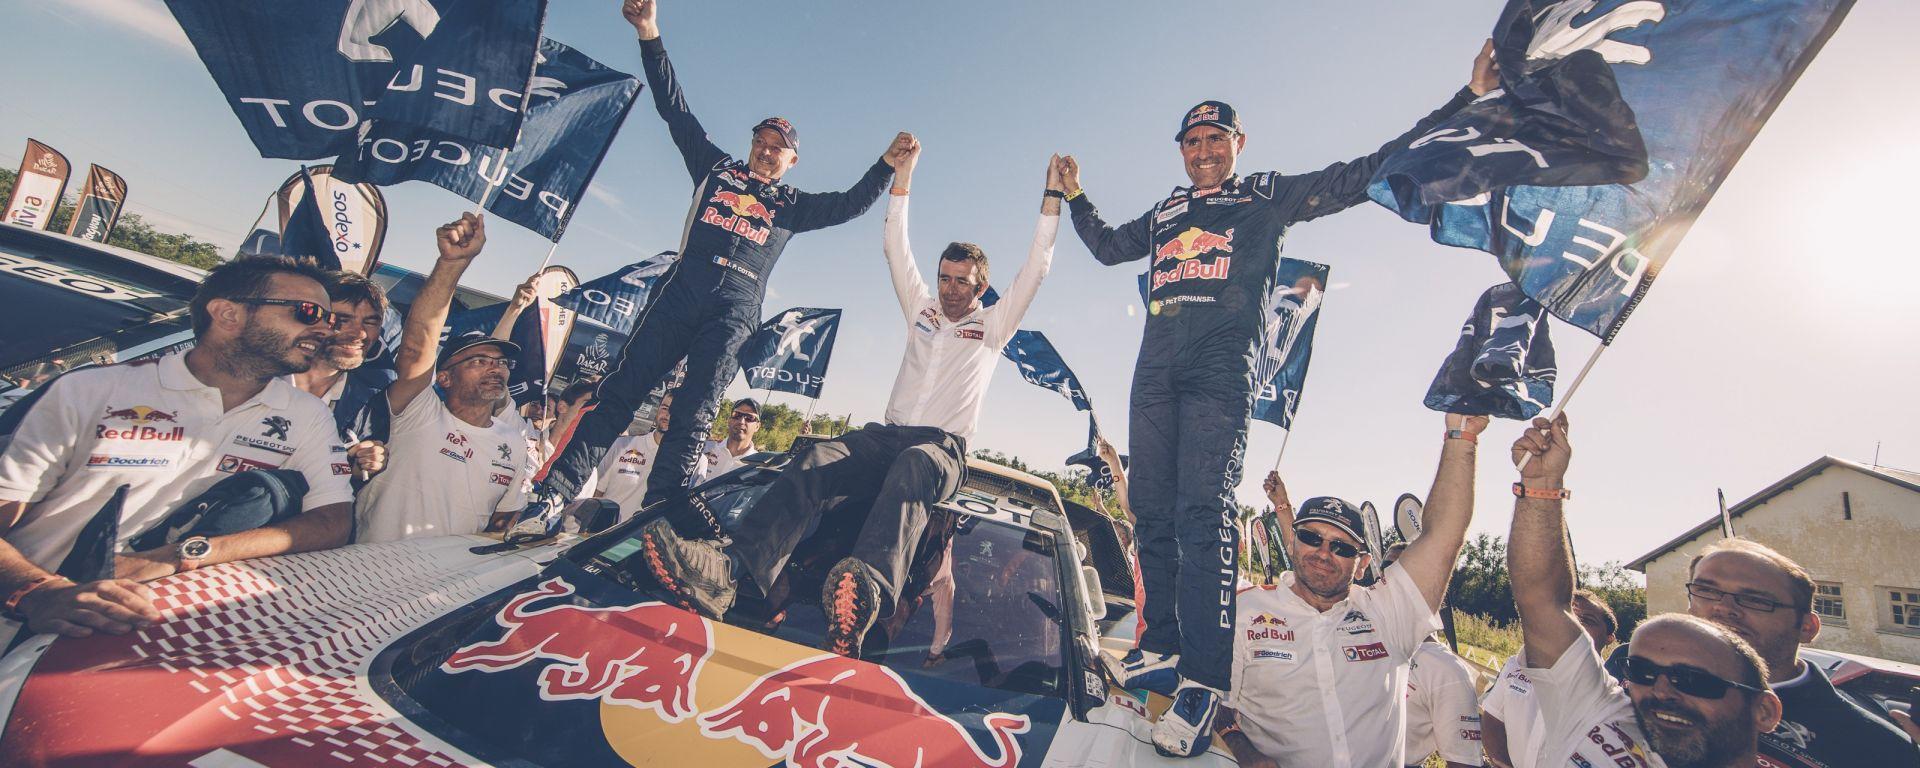 Dakar 2017: che trionfo per Peugeot e la sua 3008 DKR